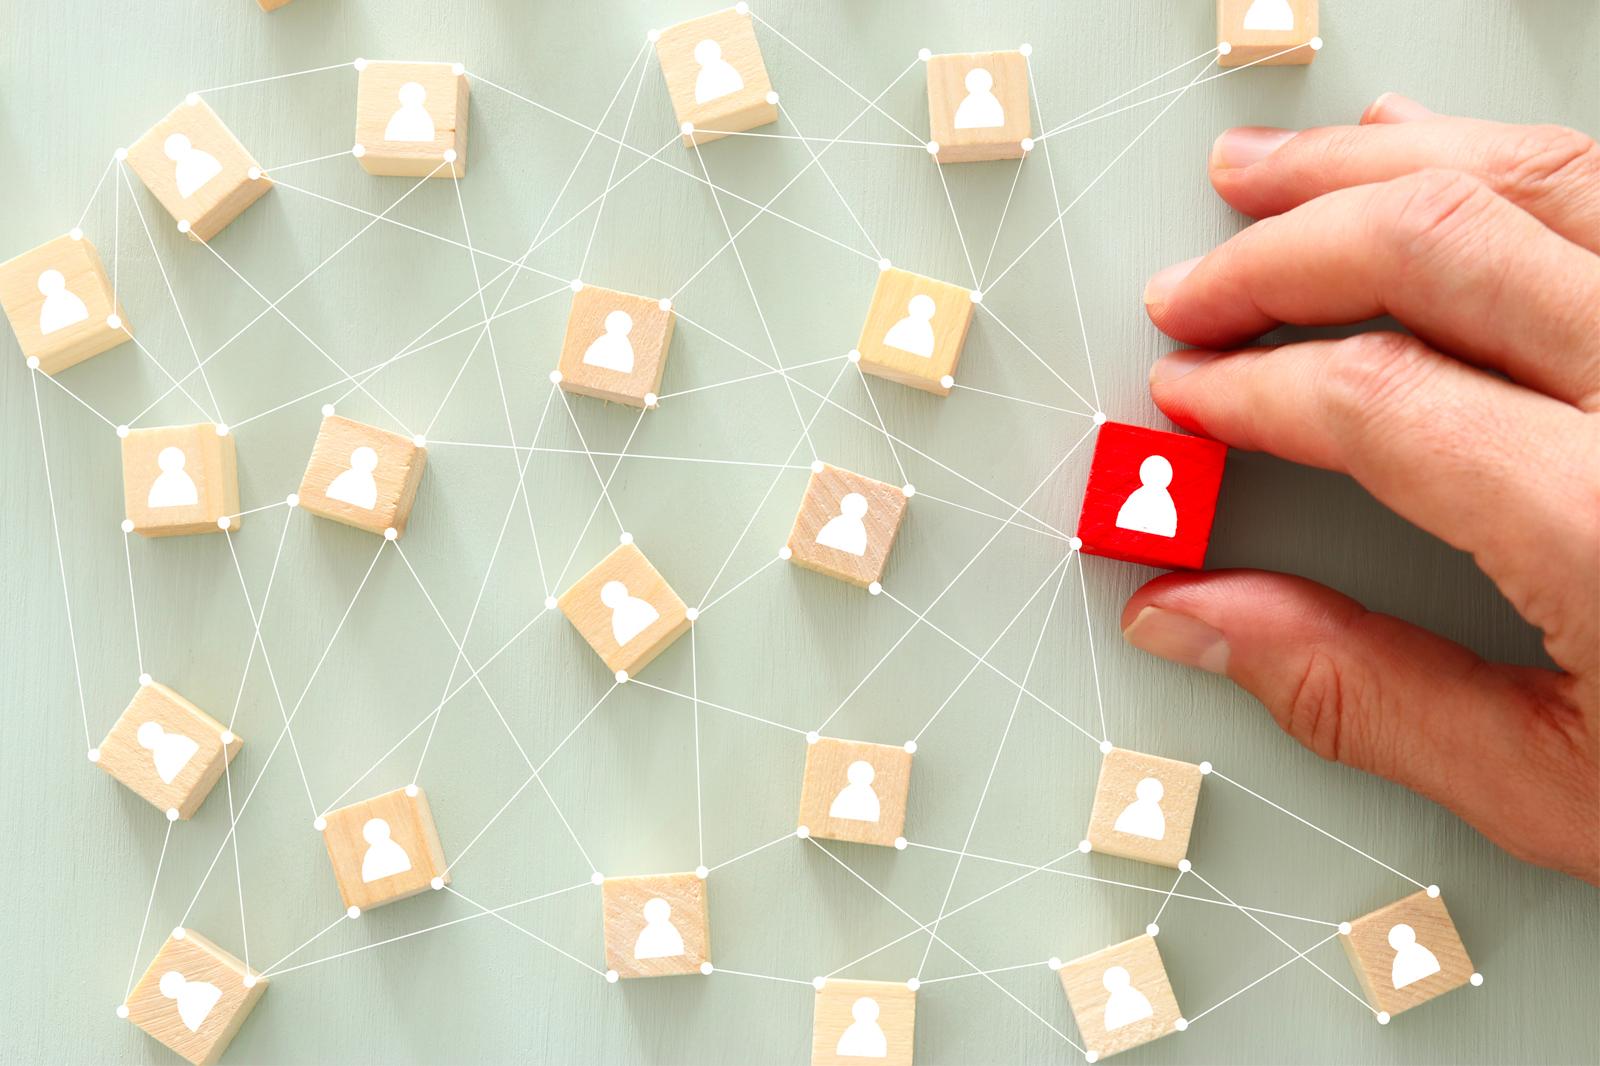 Healthcare Management - Online Microcredential - FutureLearn